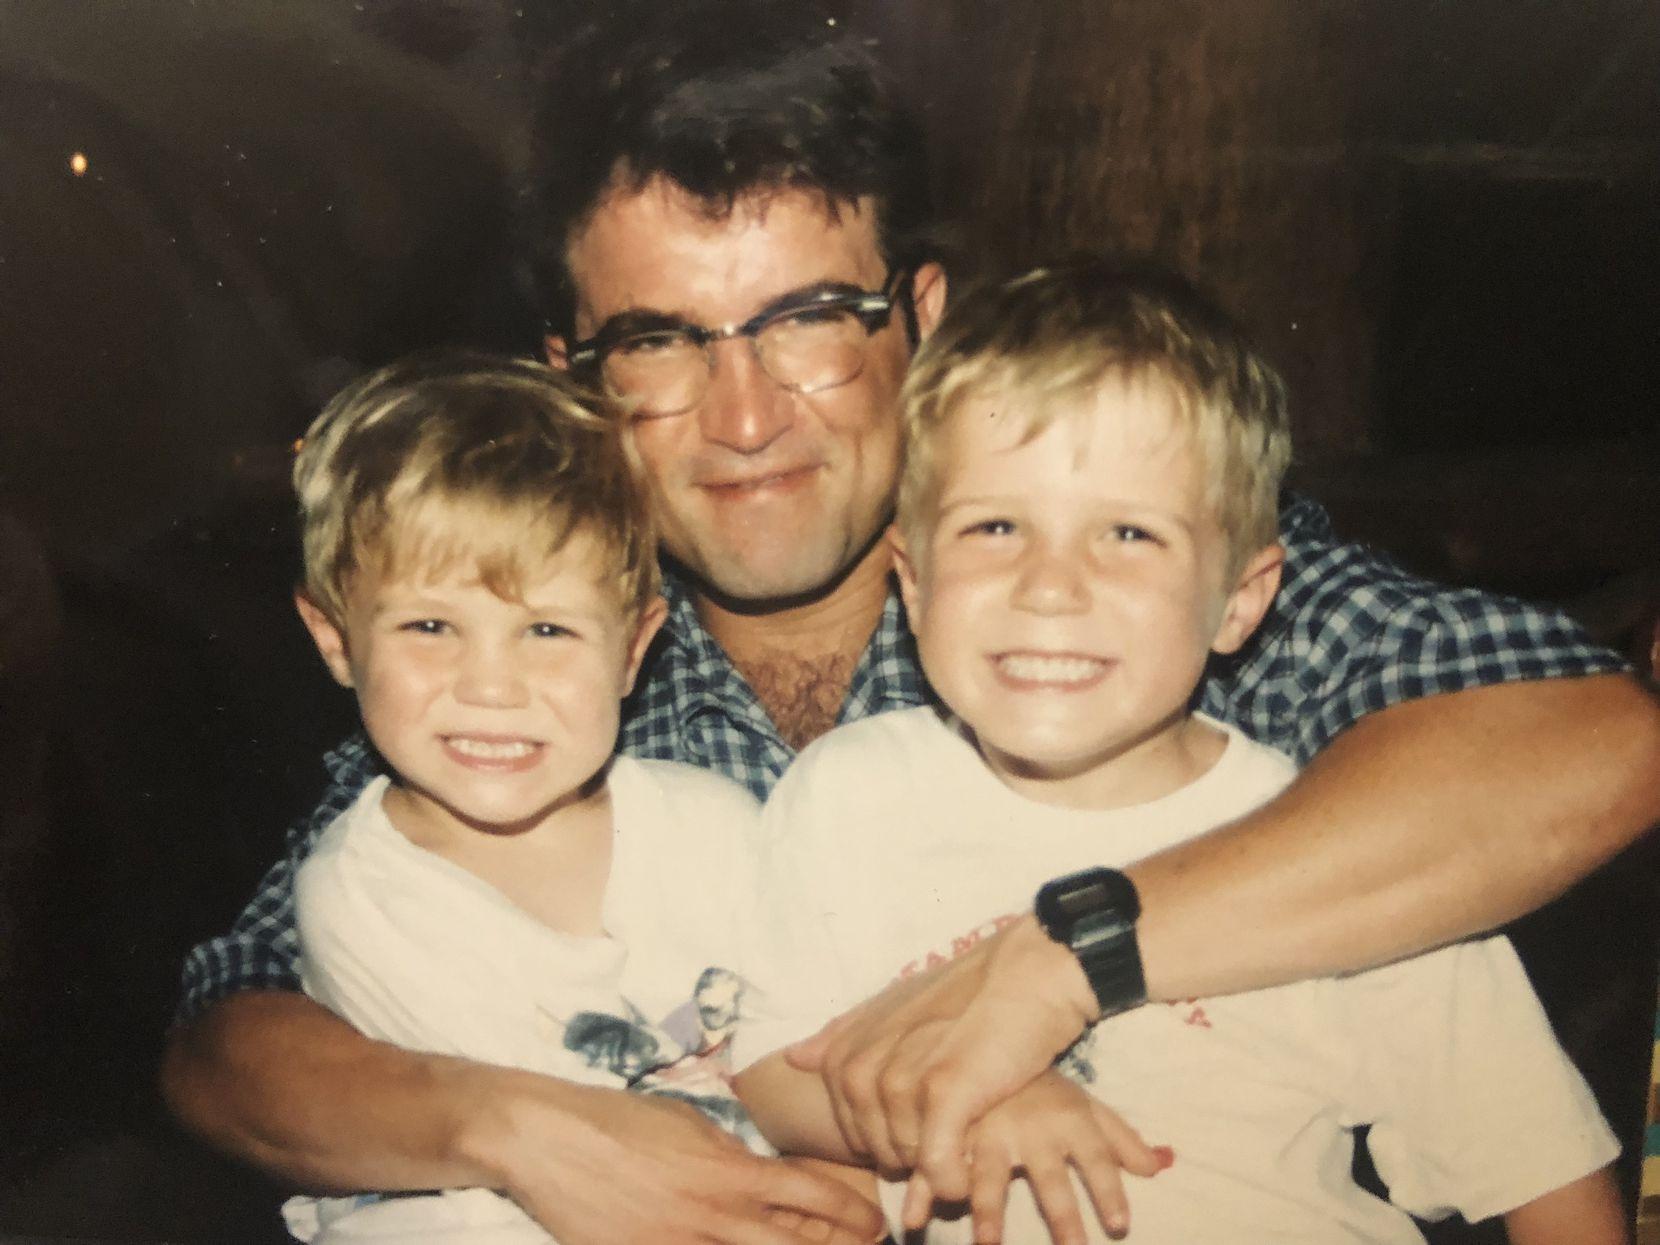 Texas Rangers outfielder Scott Heineman, left, and San Francisco Giants catcher Tyler Heineman are pictured as children are pictured with father Steve Heineman.